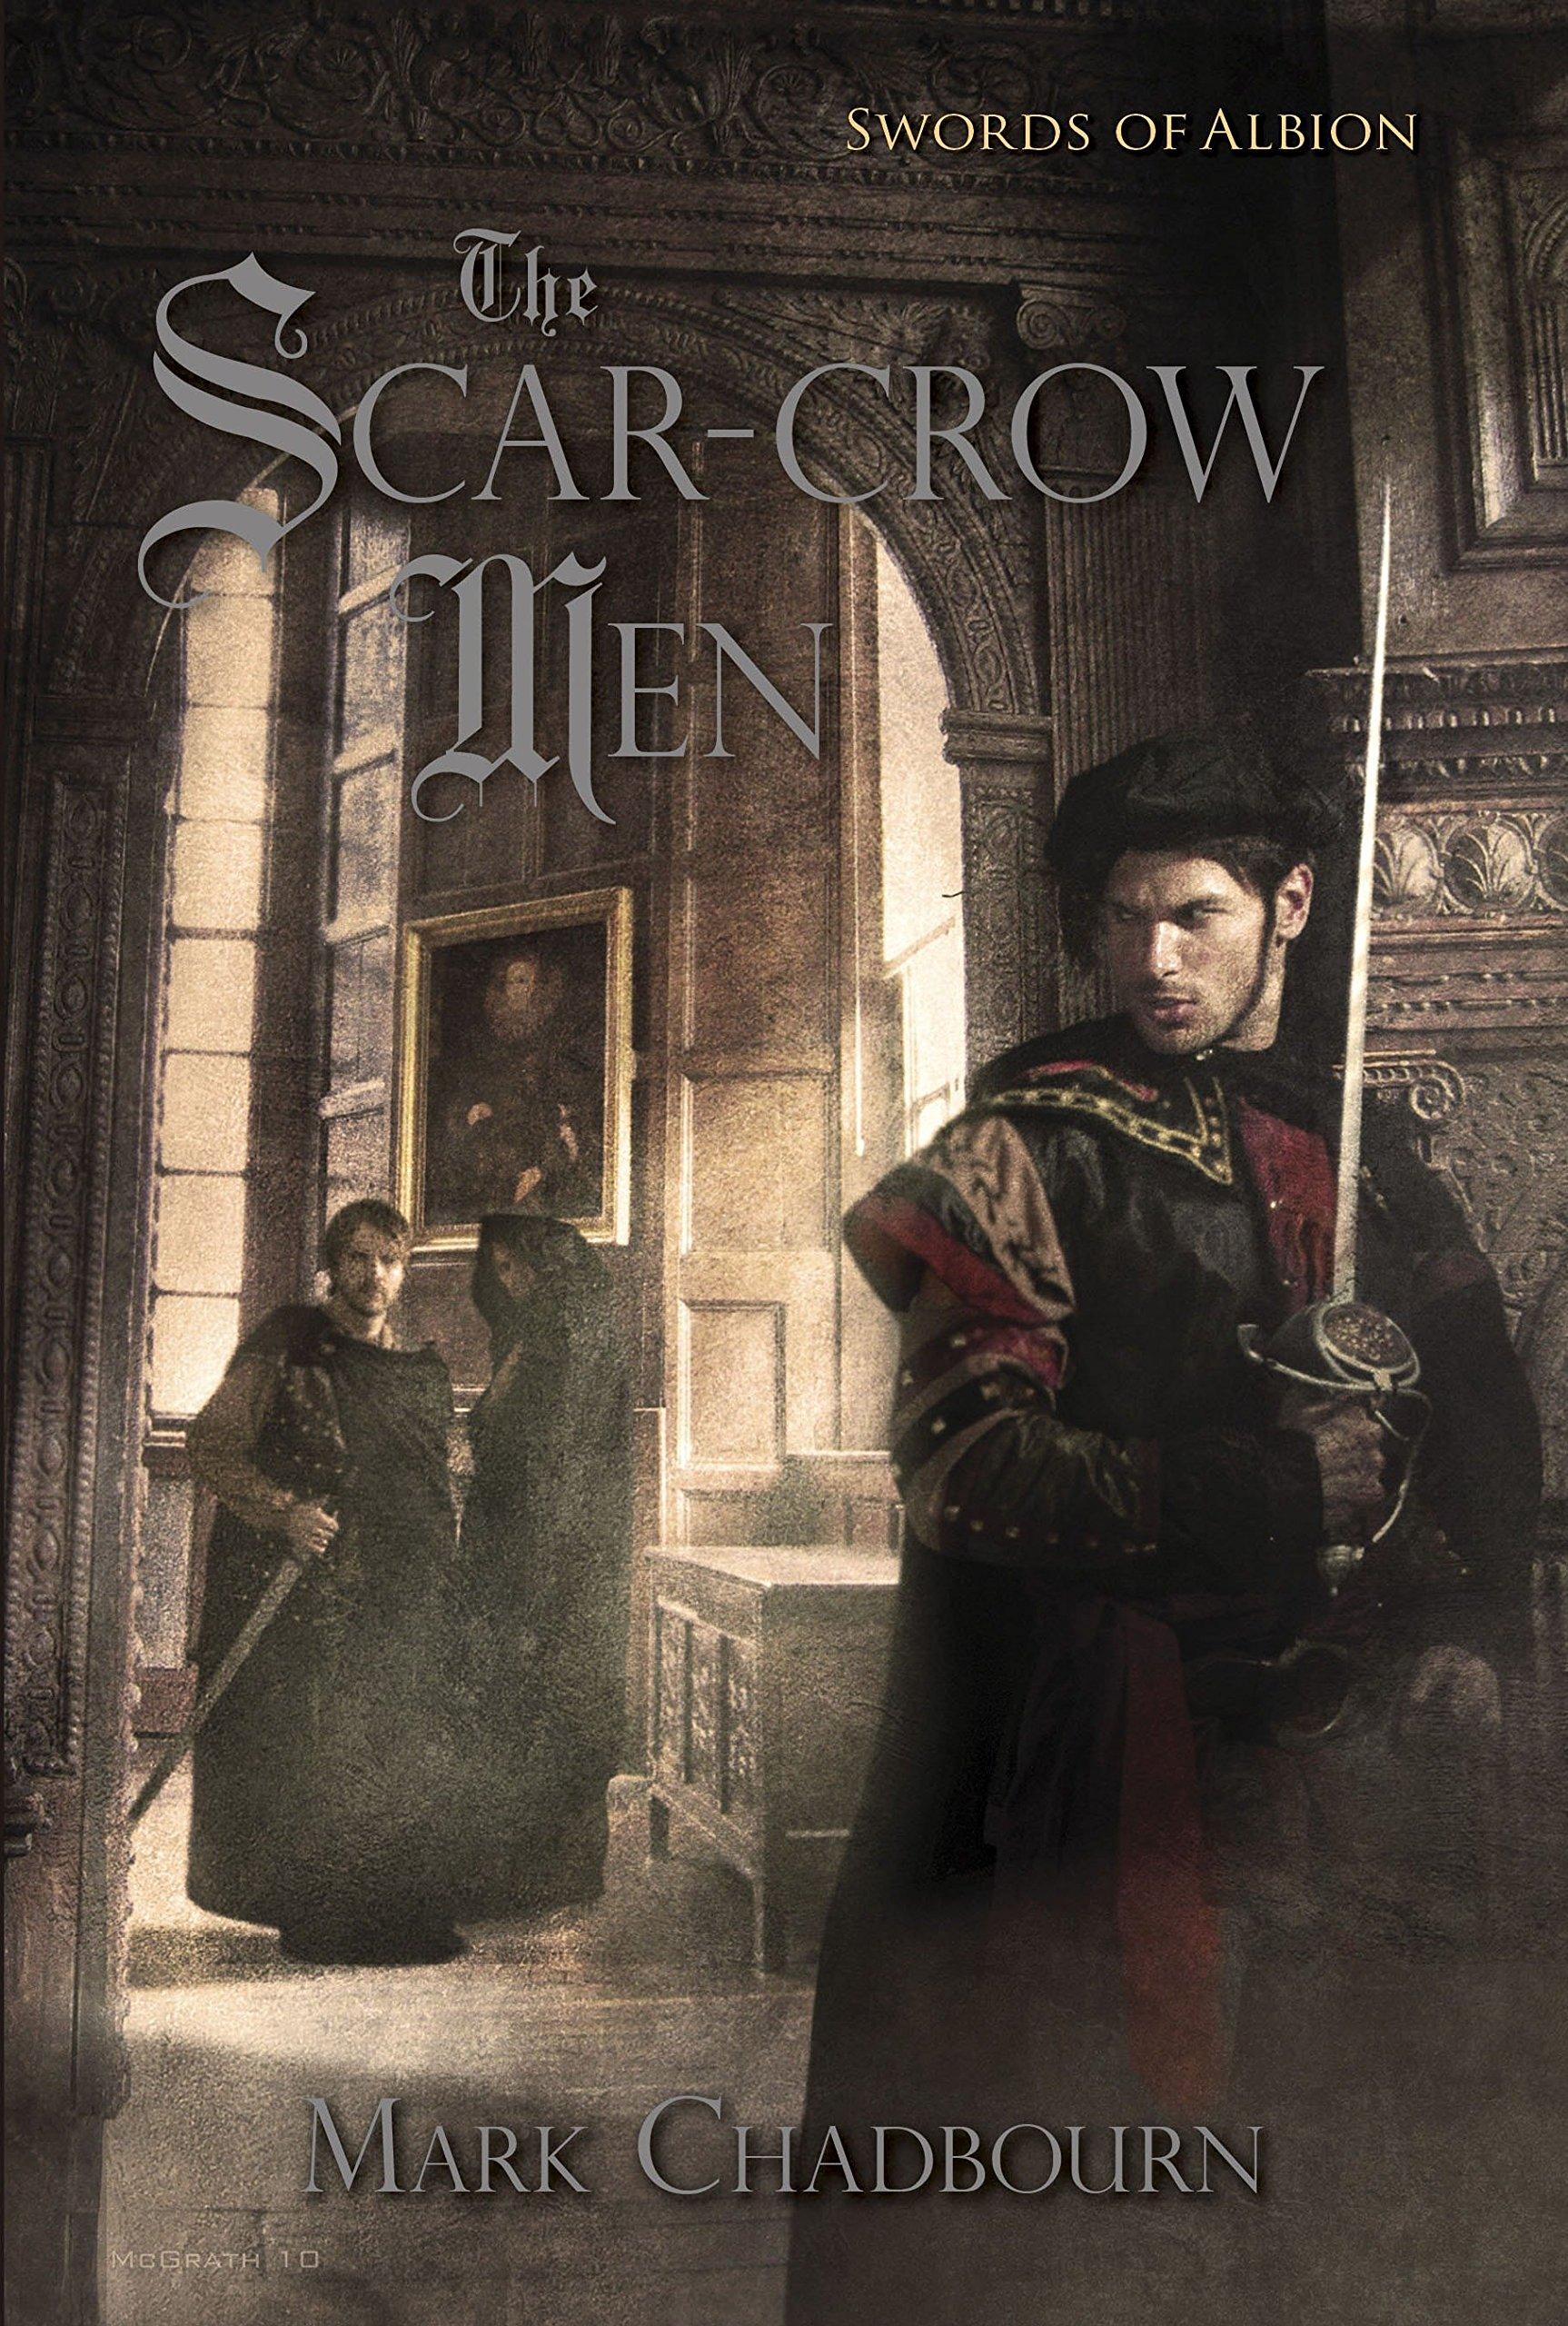 Download The Scar-Crow Men (Swords of Albion) PDF